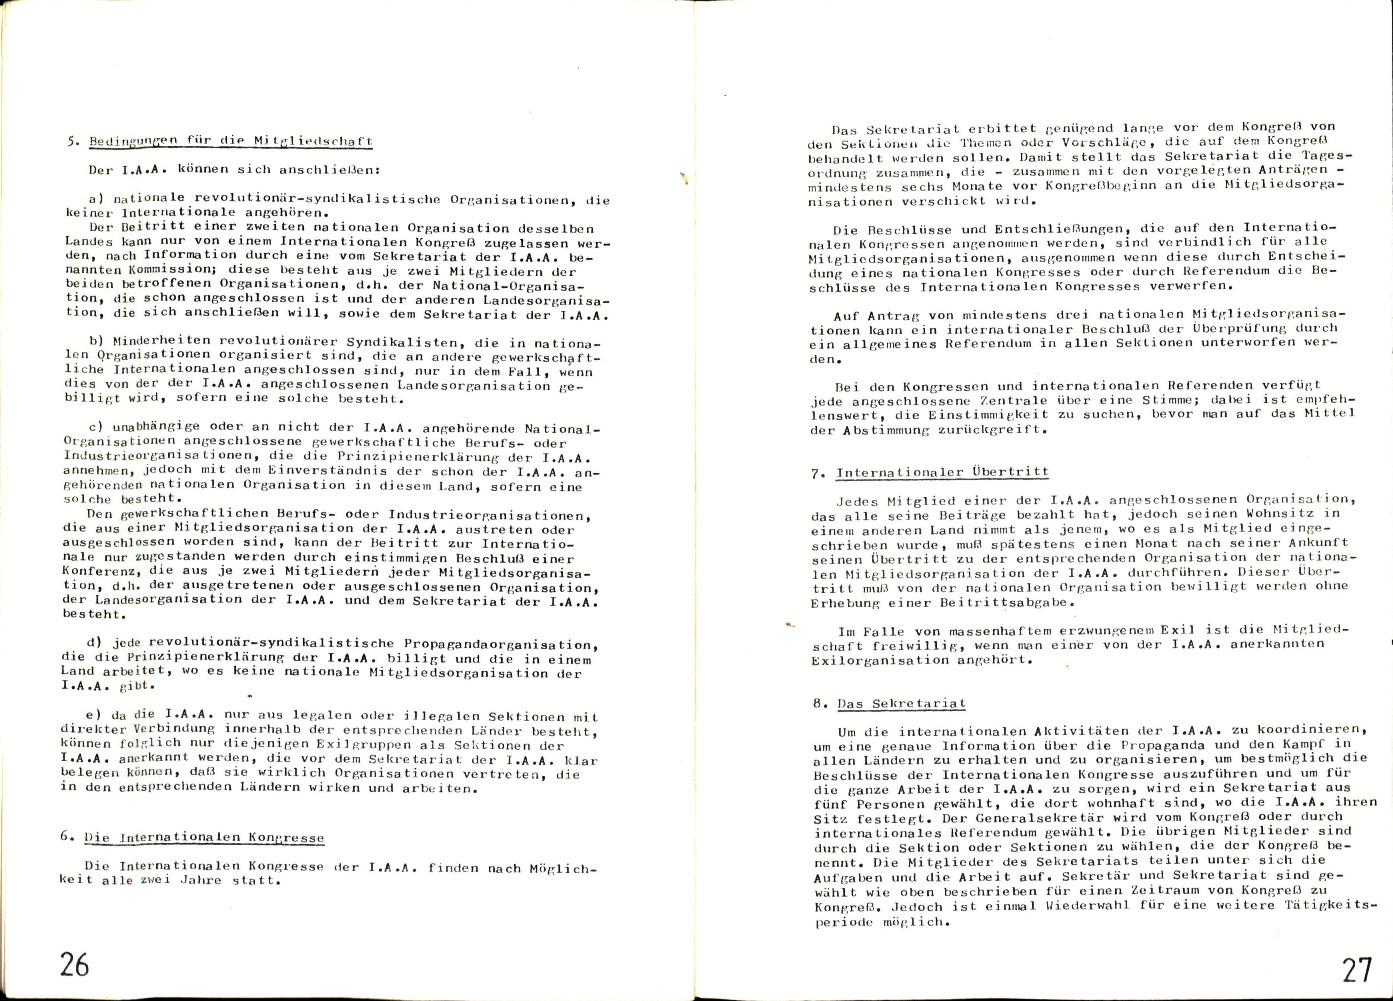 FAU_1979_Arbeitsgrundlage_14